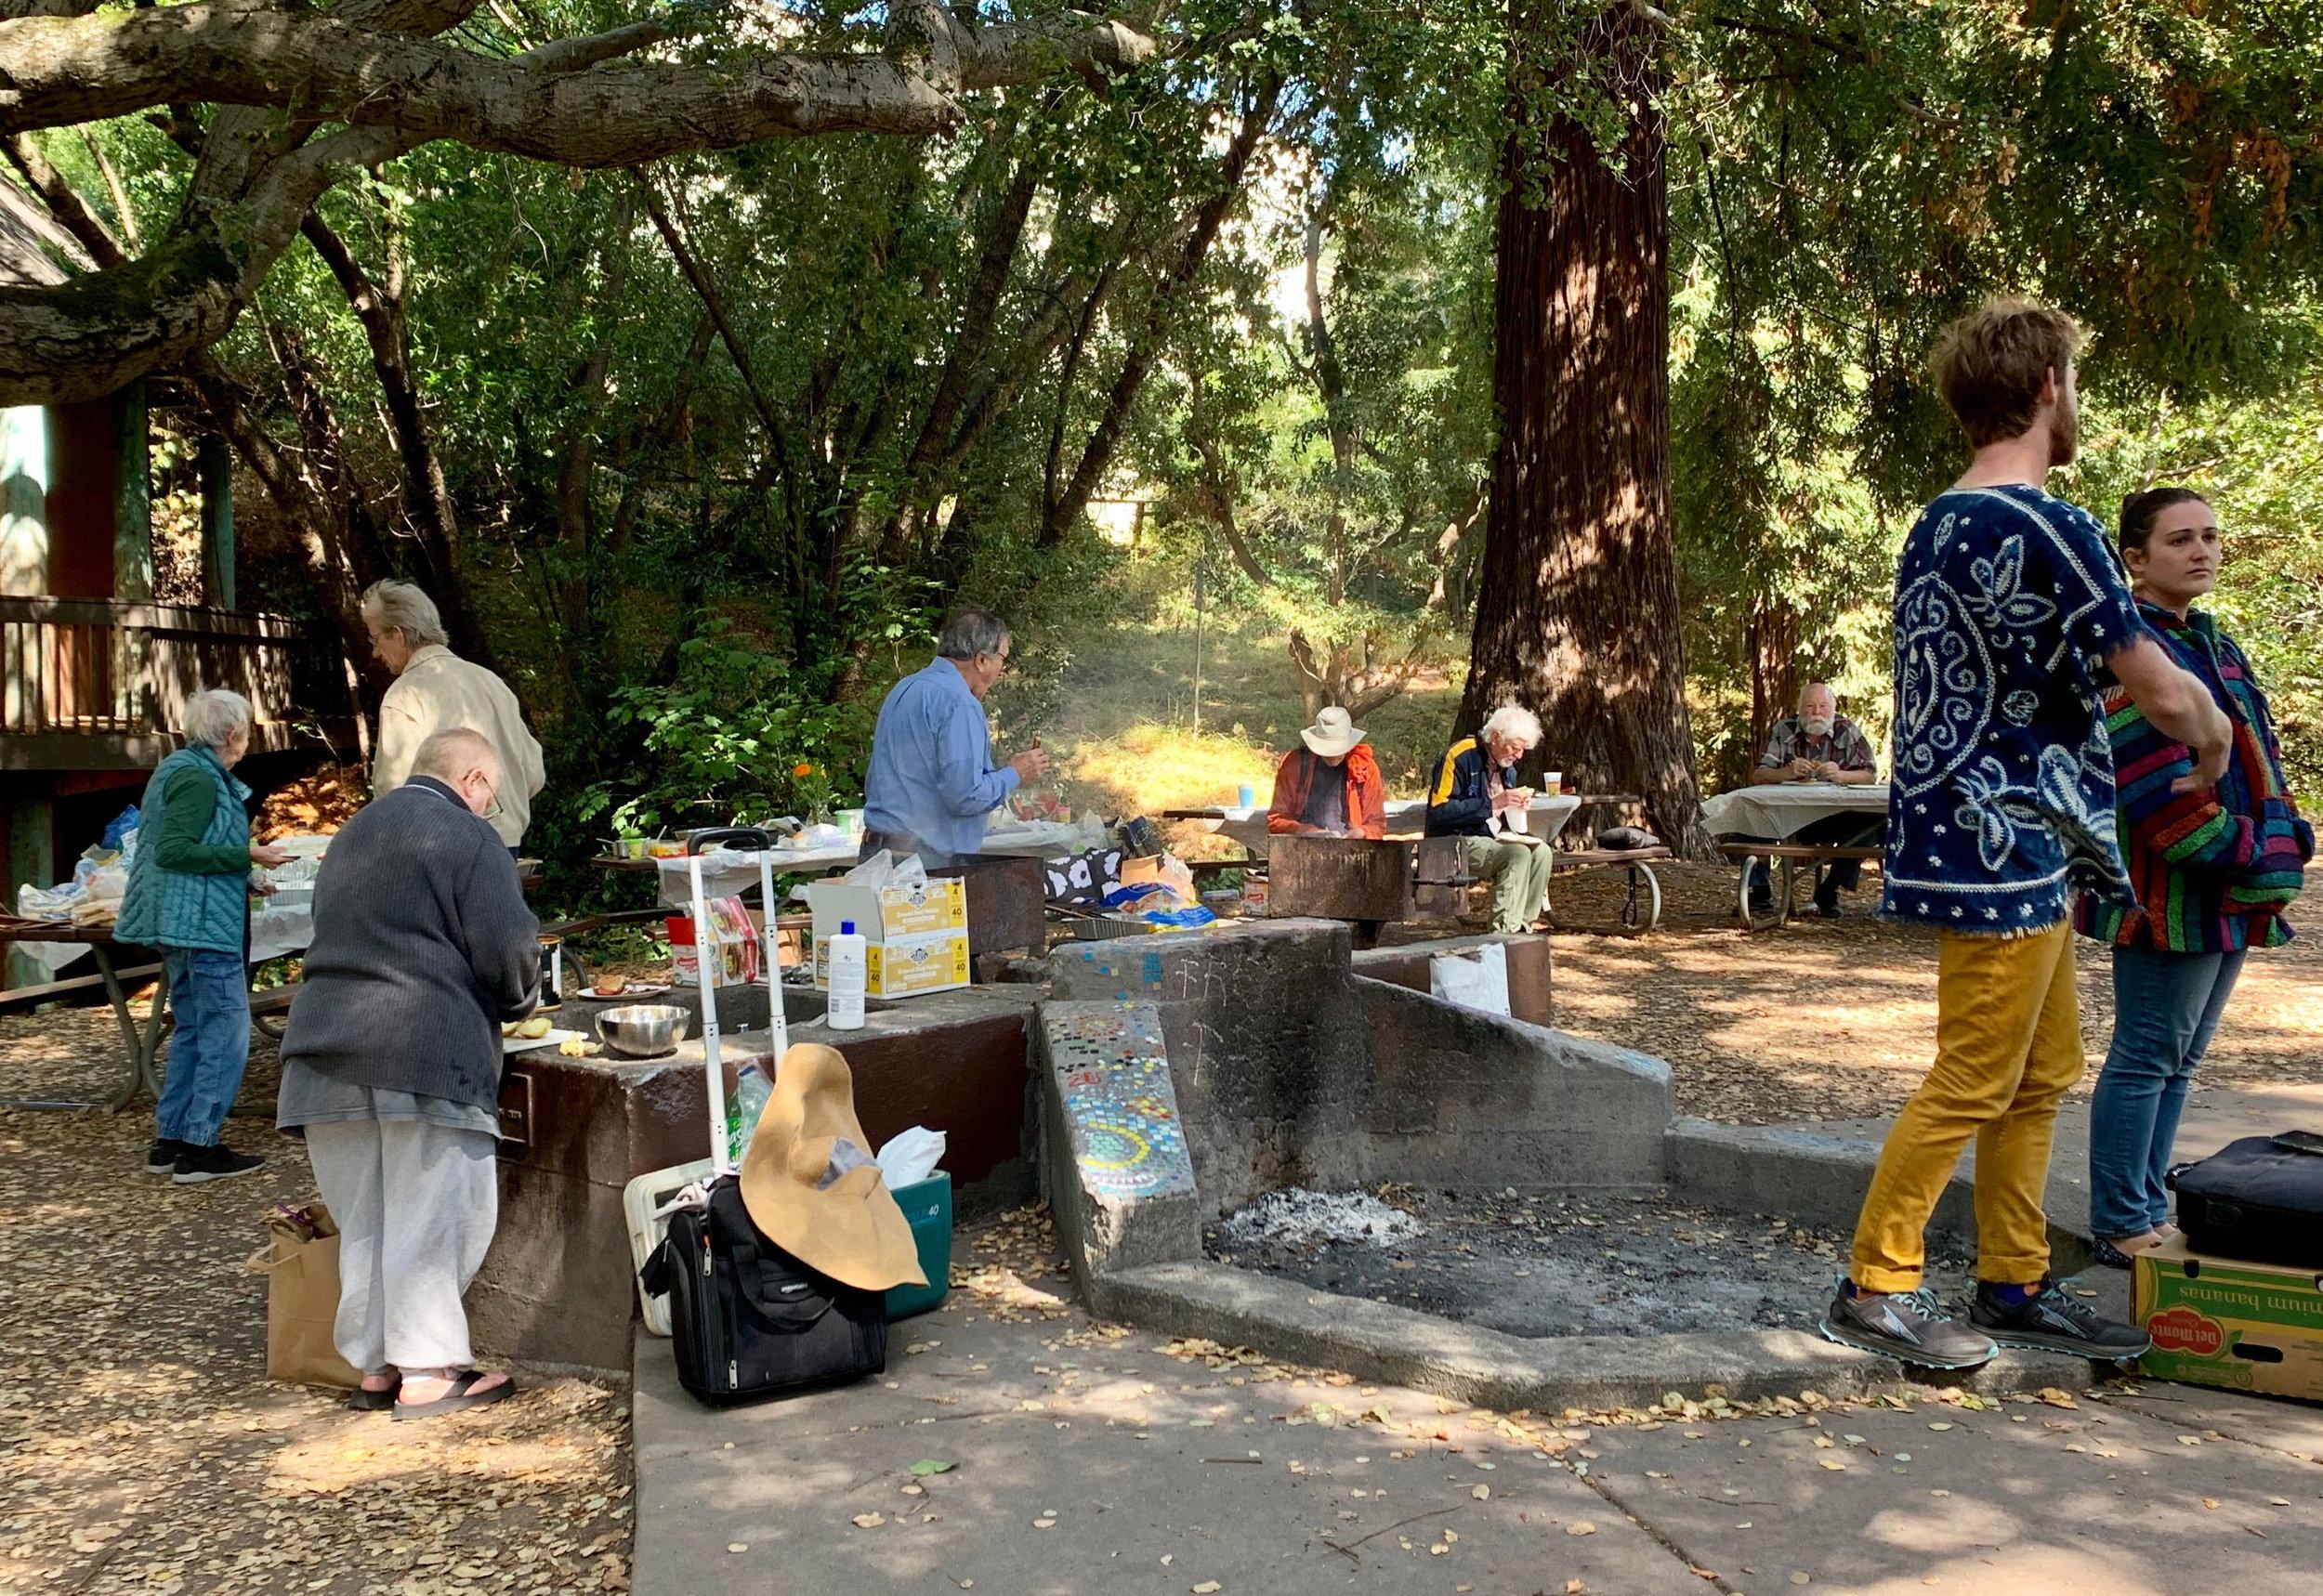 picnic 4 2019.jpg